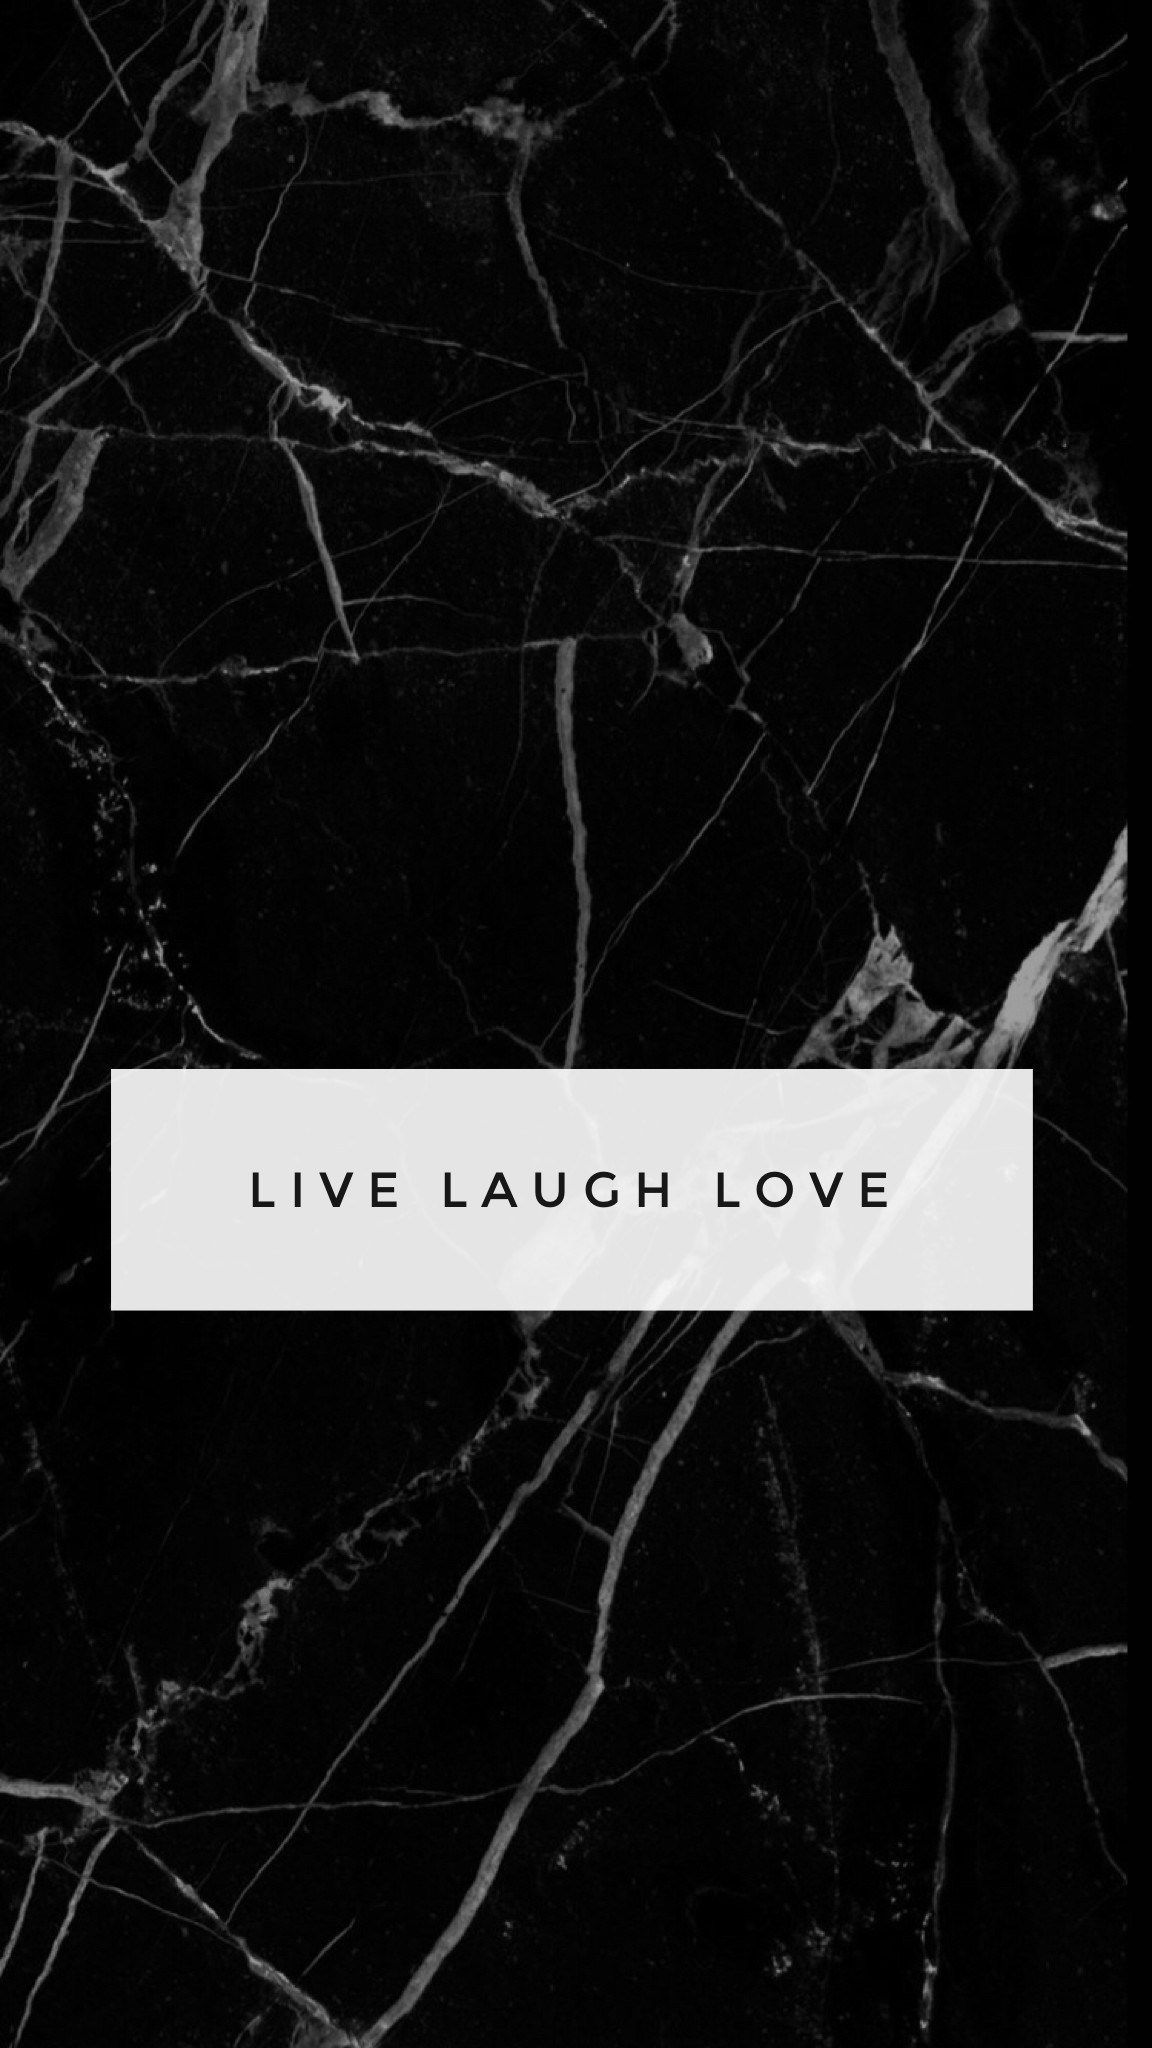 Live Laugh Love Iphone Wallpaper Tumblr Aesthetic Iphone